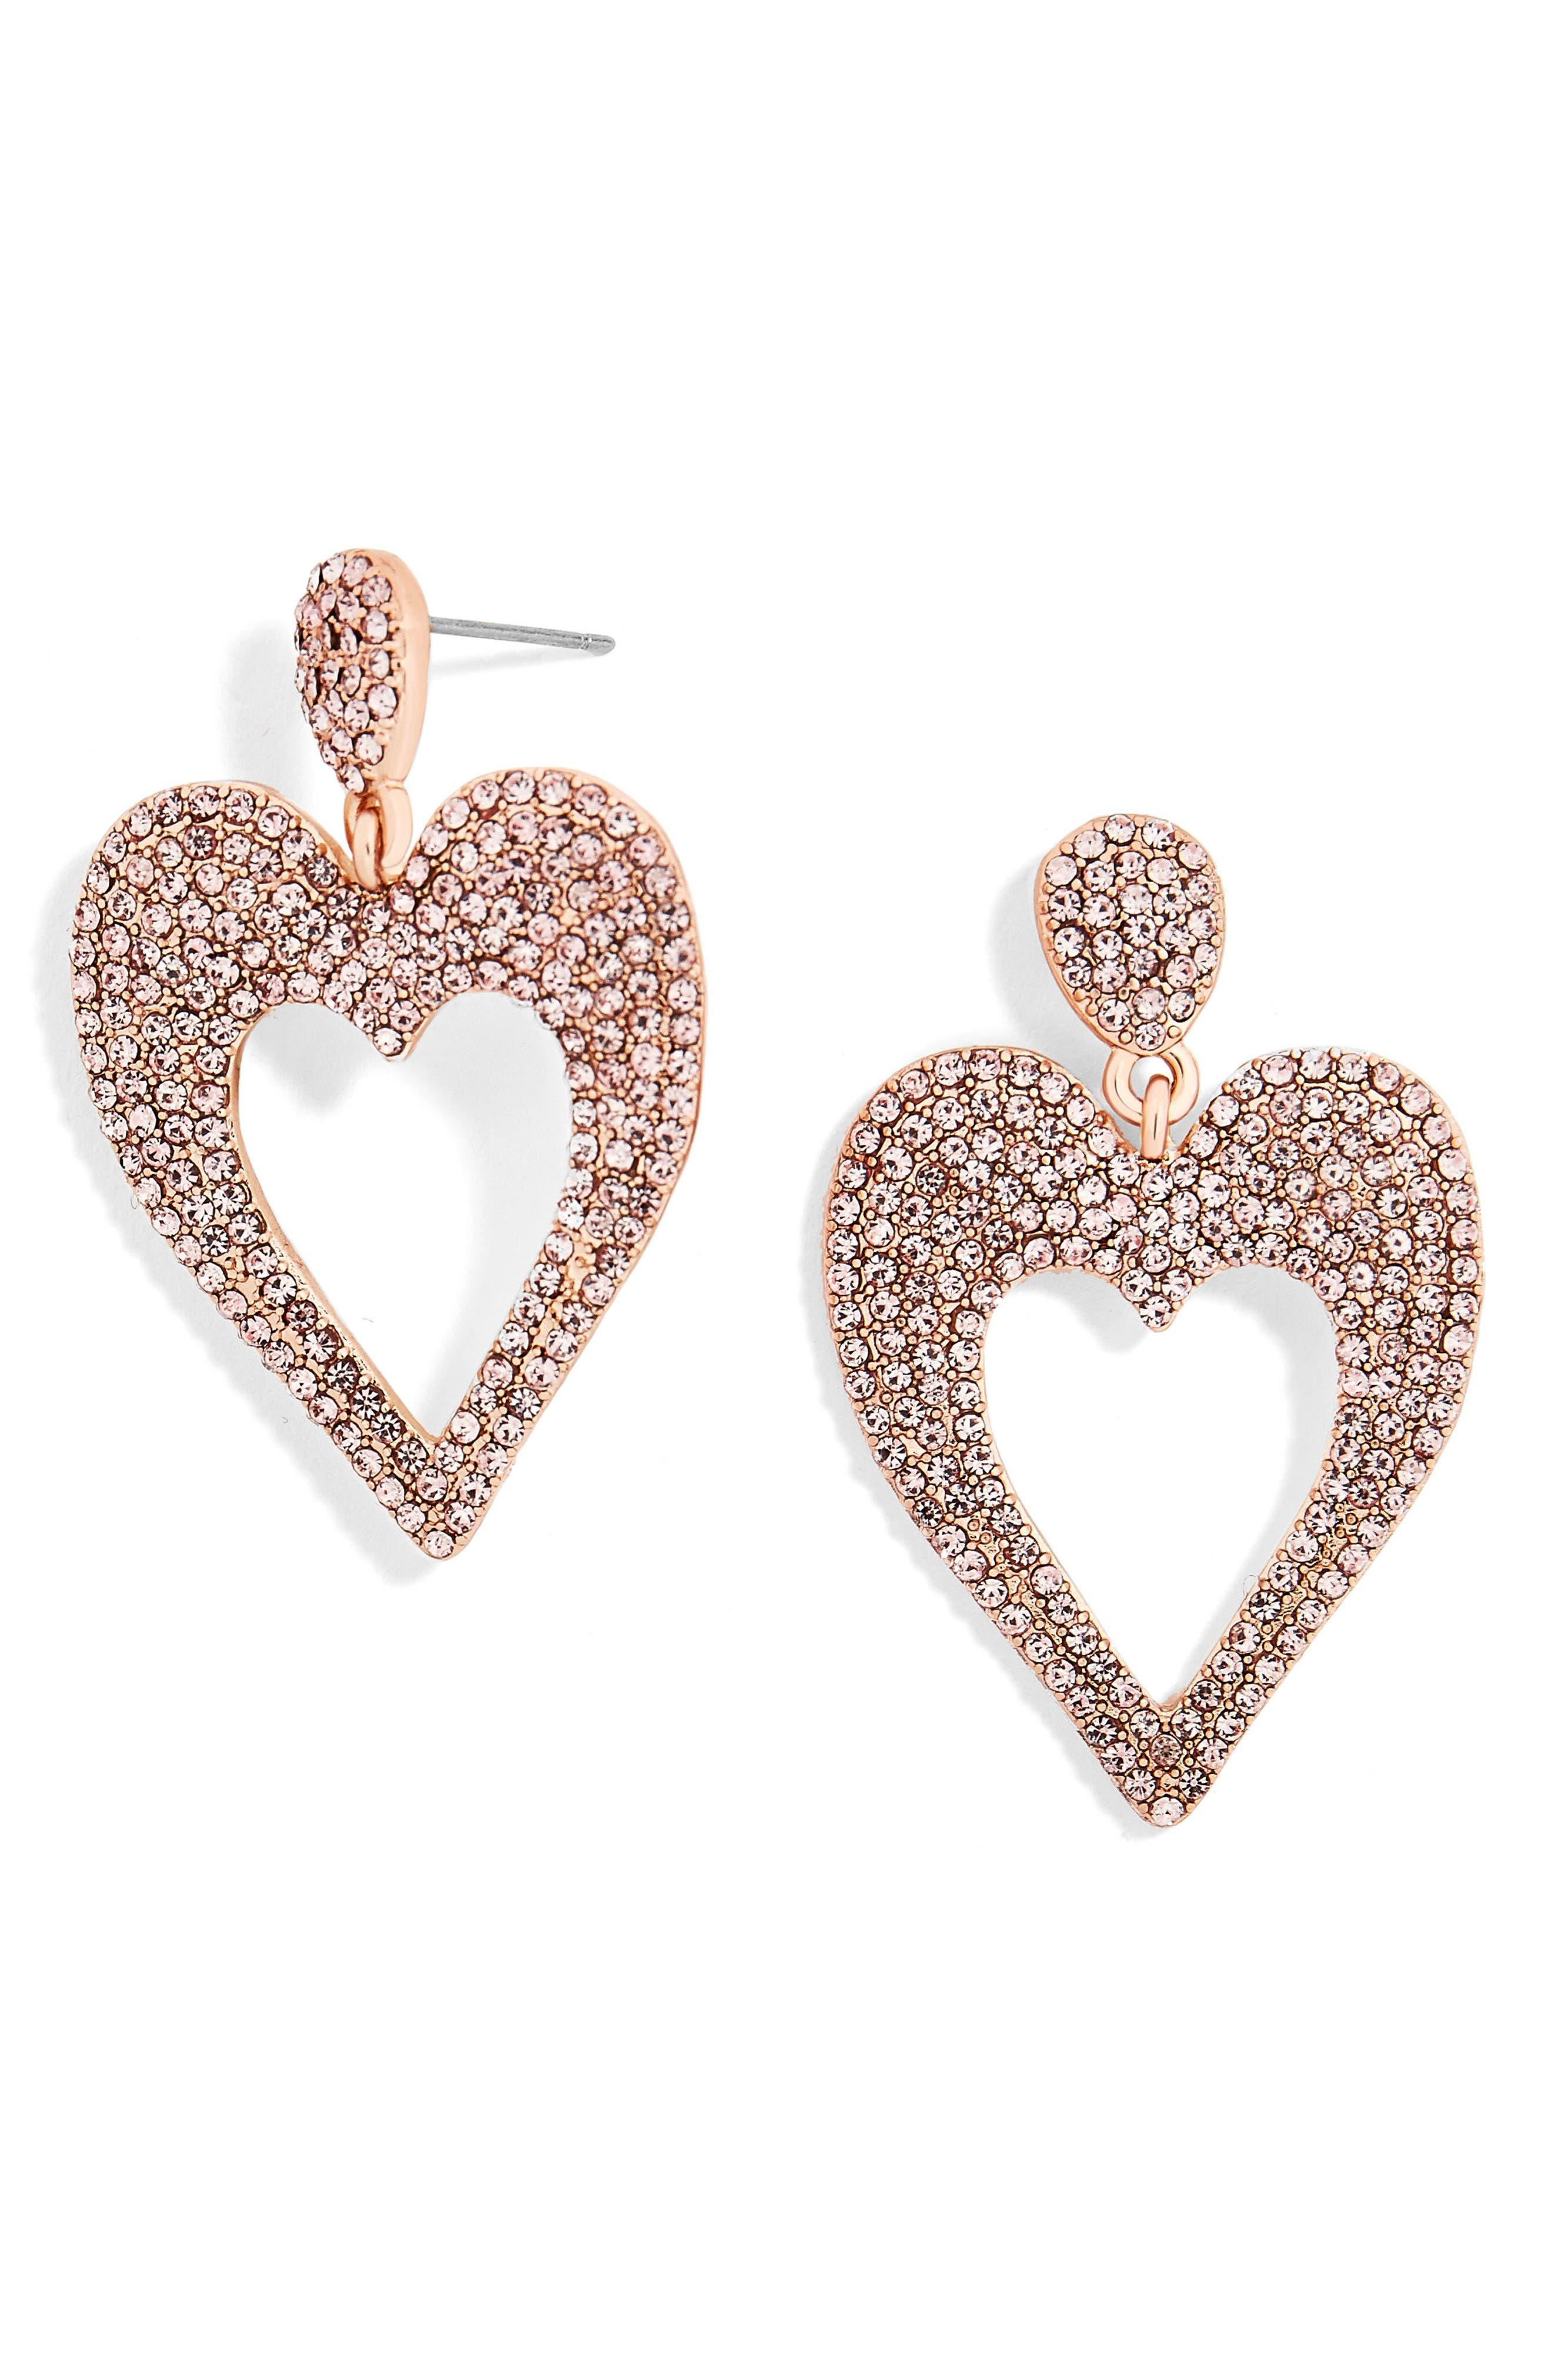 Amara Pavé Heart Drop Earrings,                             Main thumbnail 1, color,                             Rose Gold